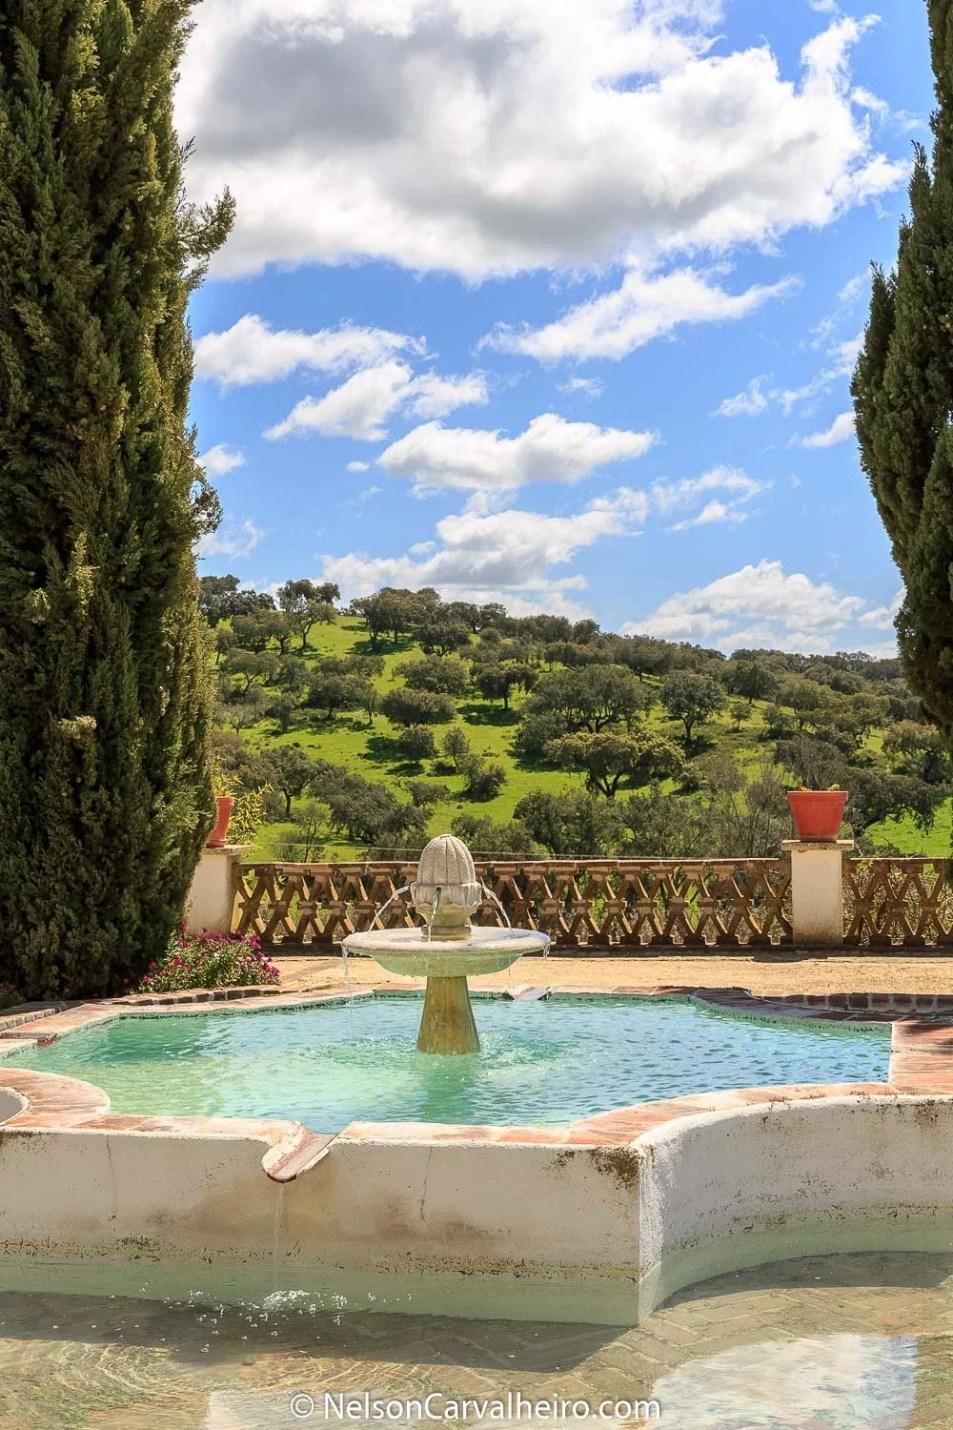 Nelson_Carvalheiro_Alentejo_Wine_Travel_Guide_Monte_Ravasqueira-25